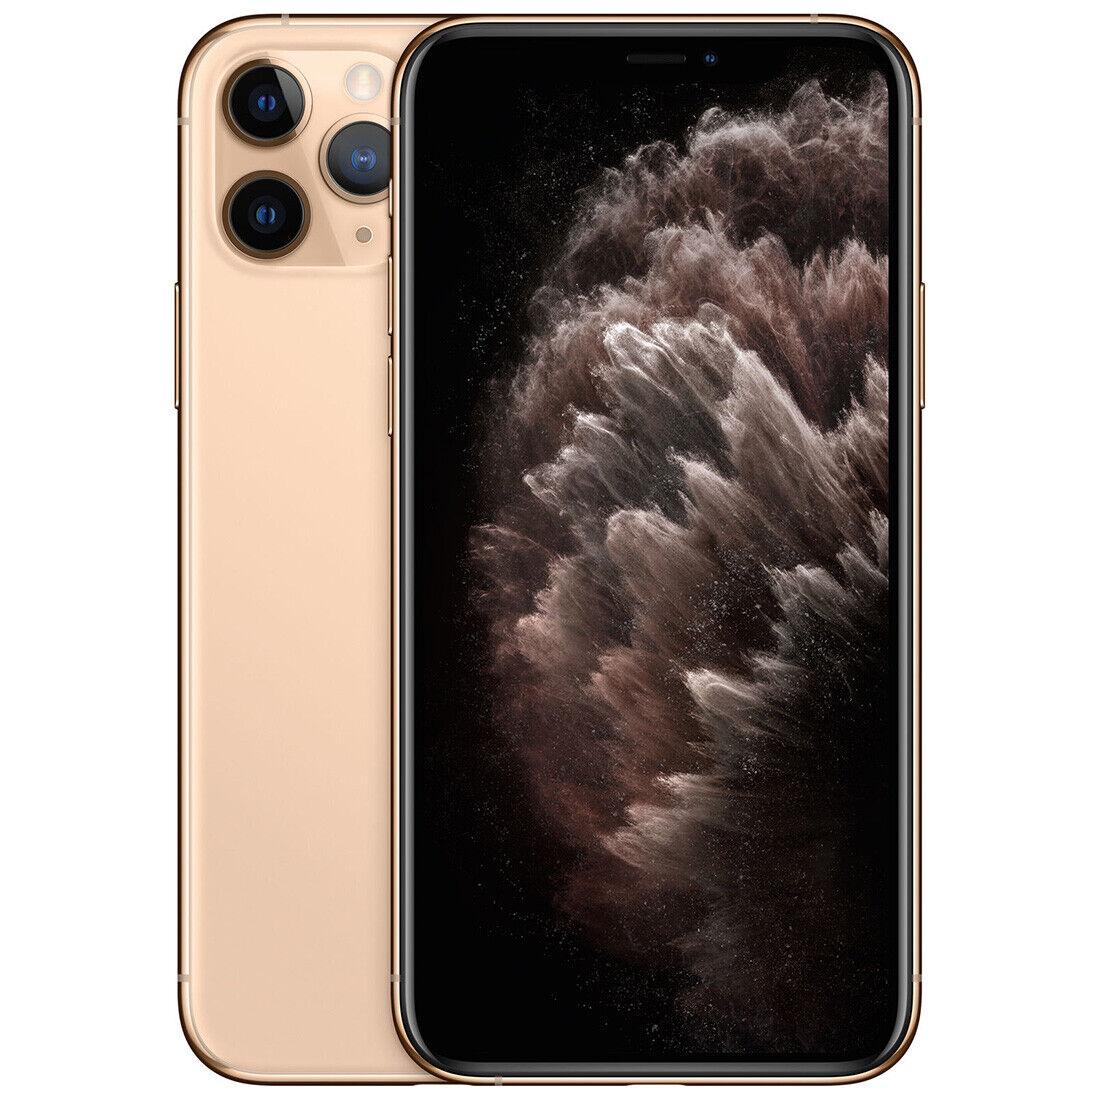 Apple iPhone 11 Pro 64GB Unlocked Smartphone. Buy it now for 589.95